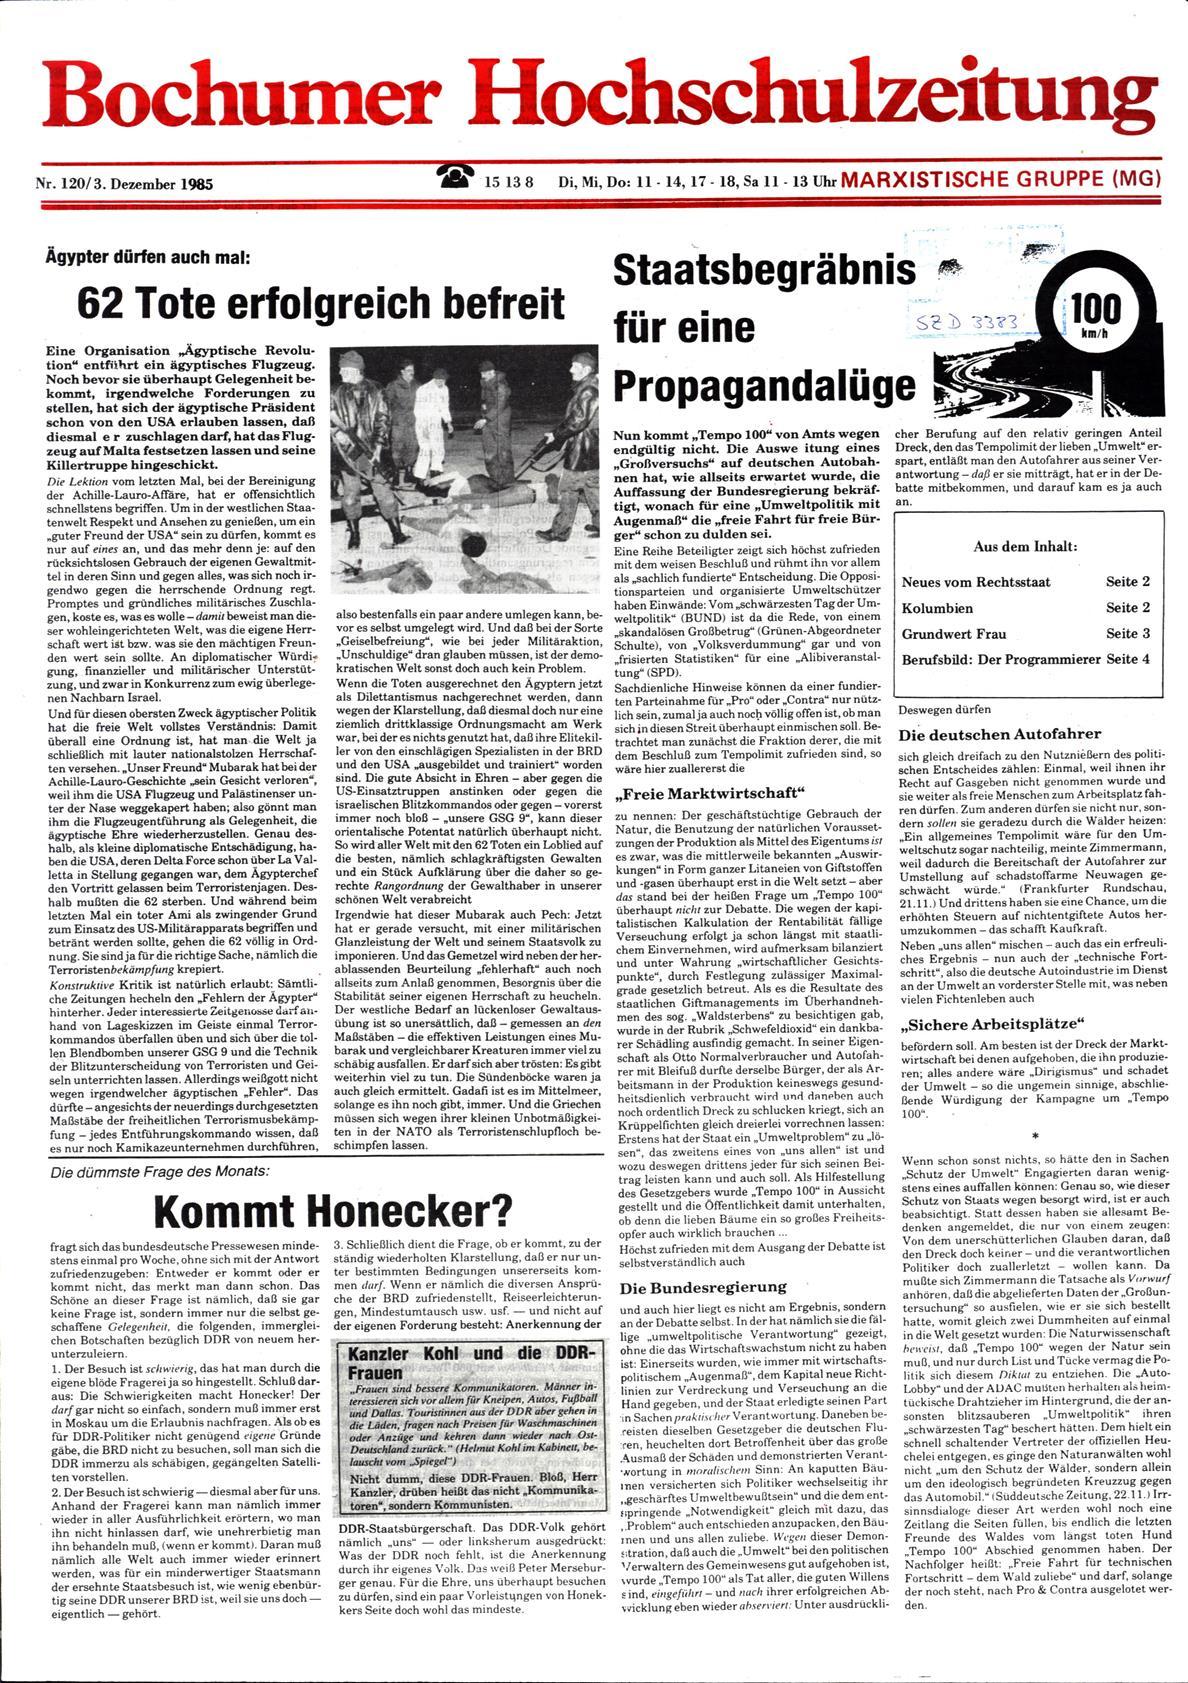 Bochum_BHZ_19851203_120_001